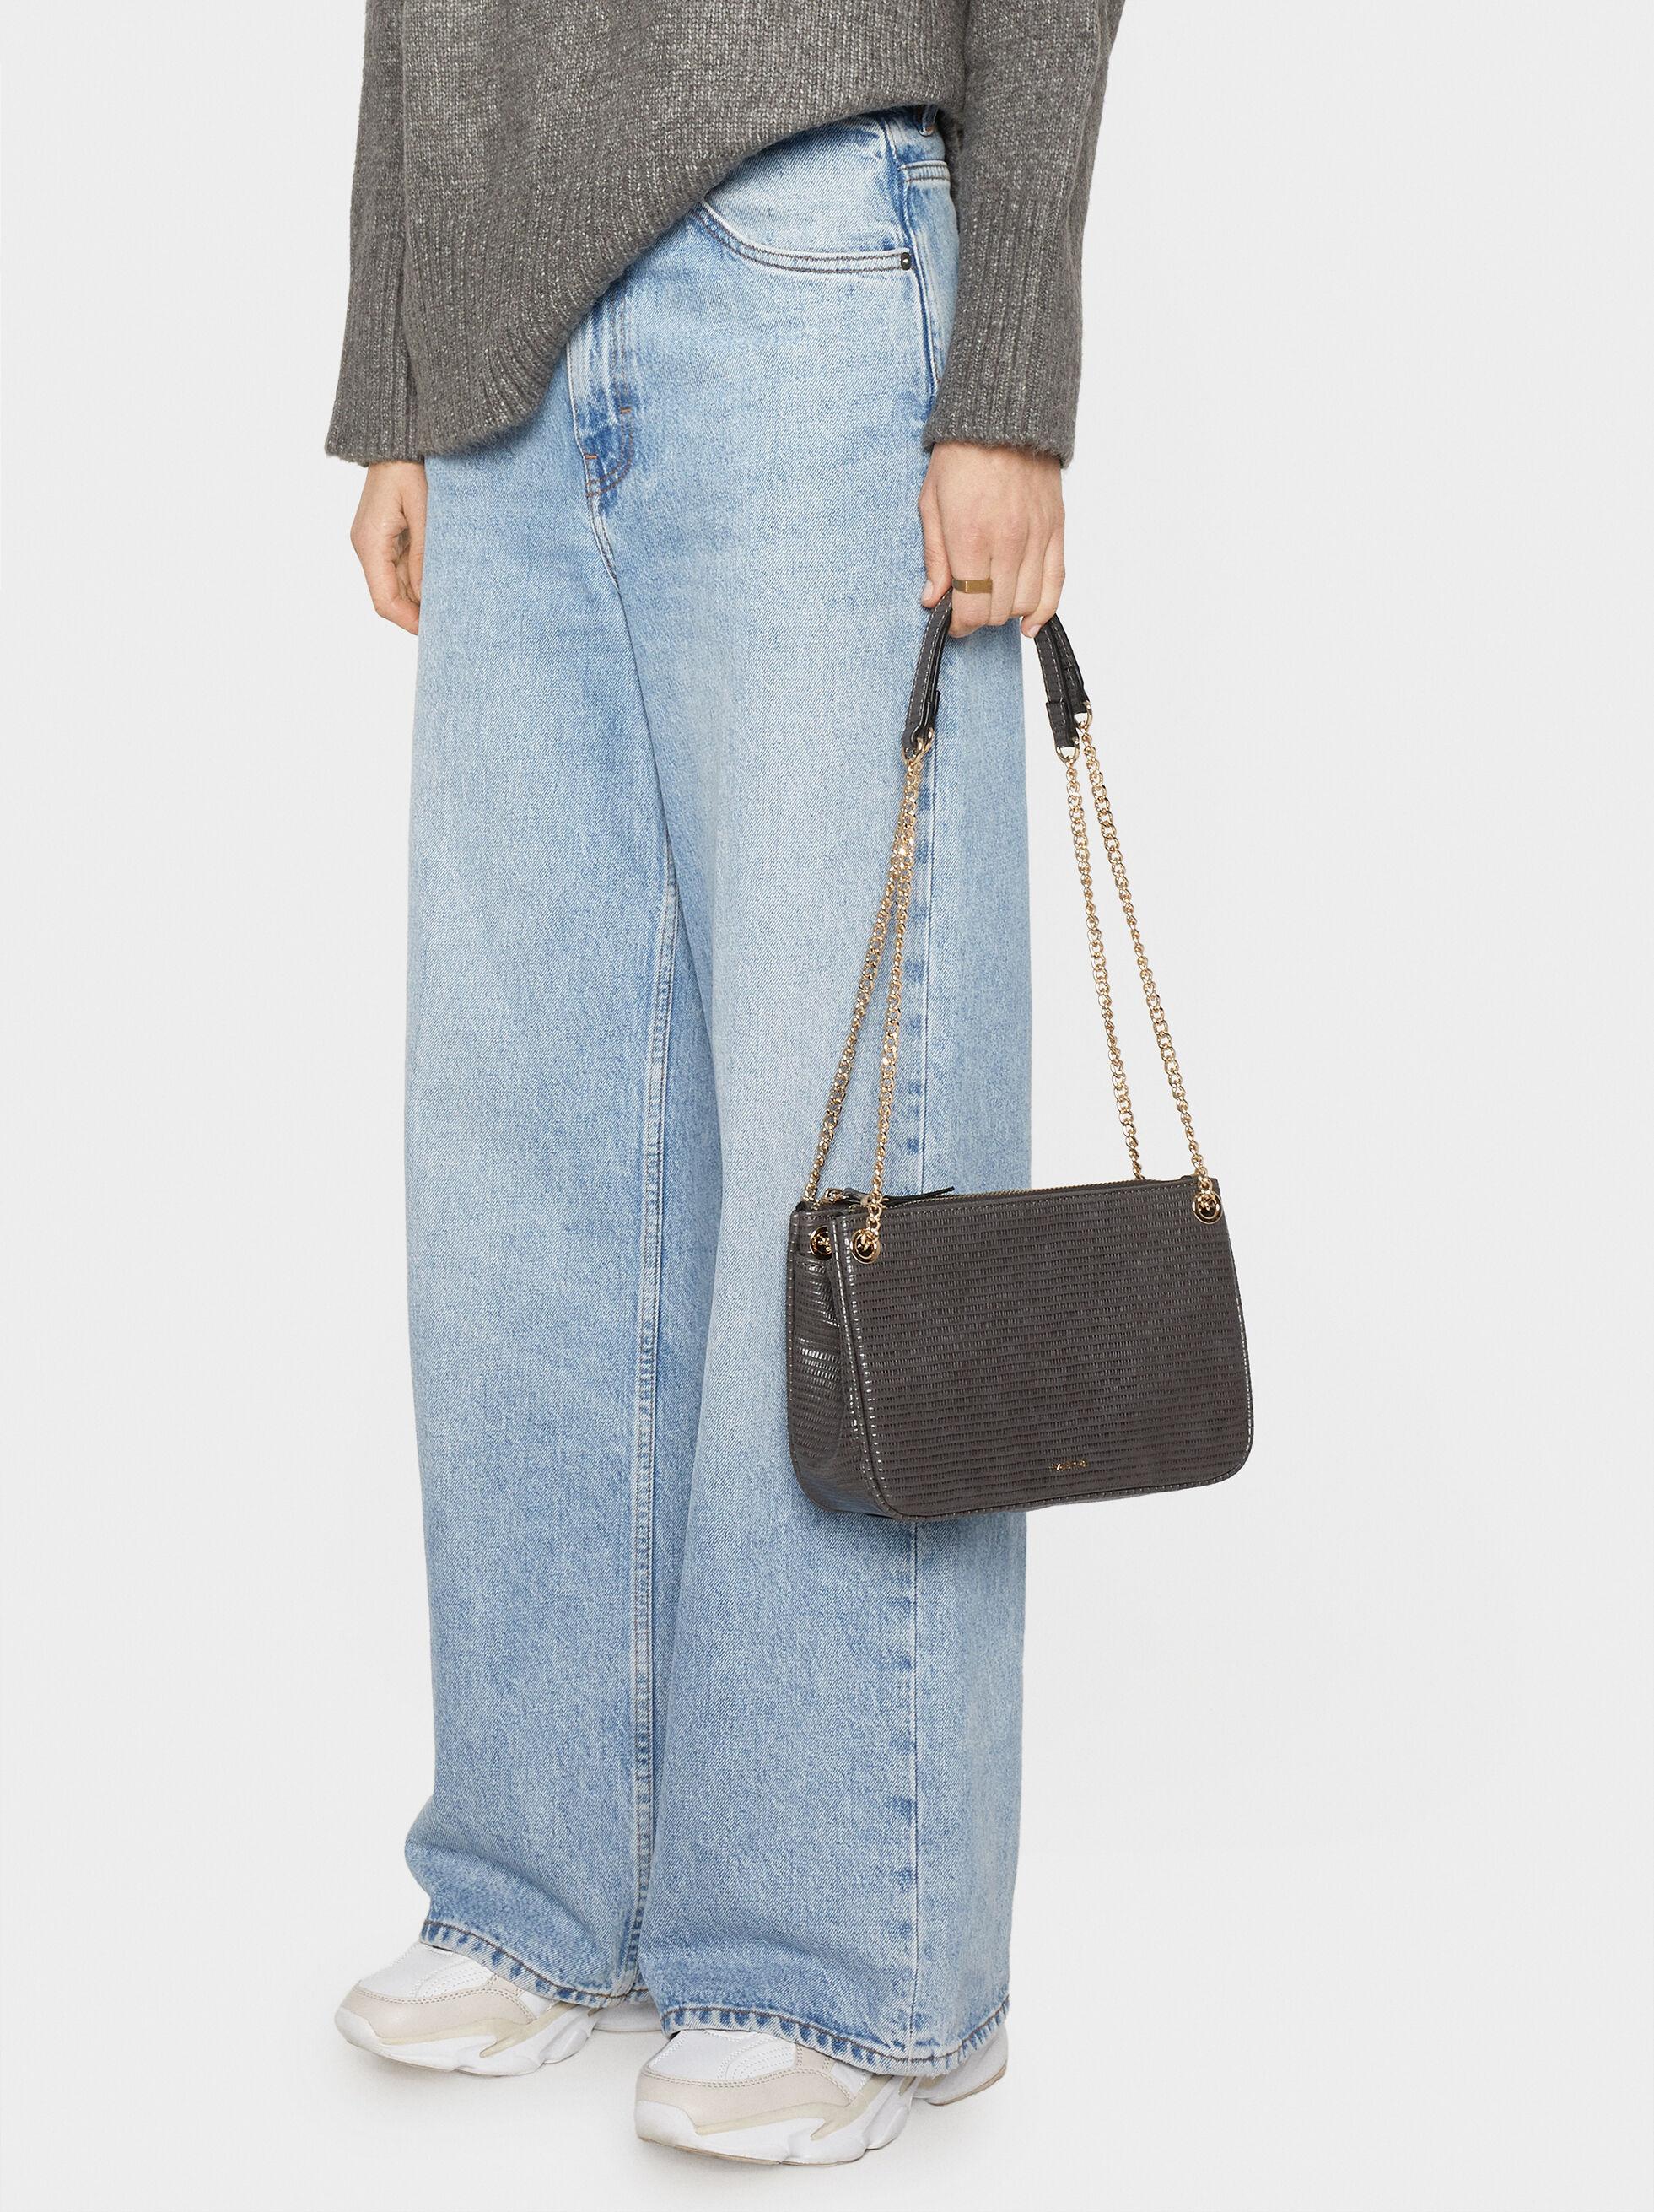 Animal Print Crossbody Bag, Grey, hi-res